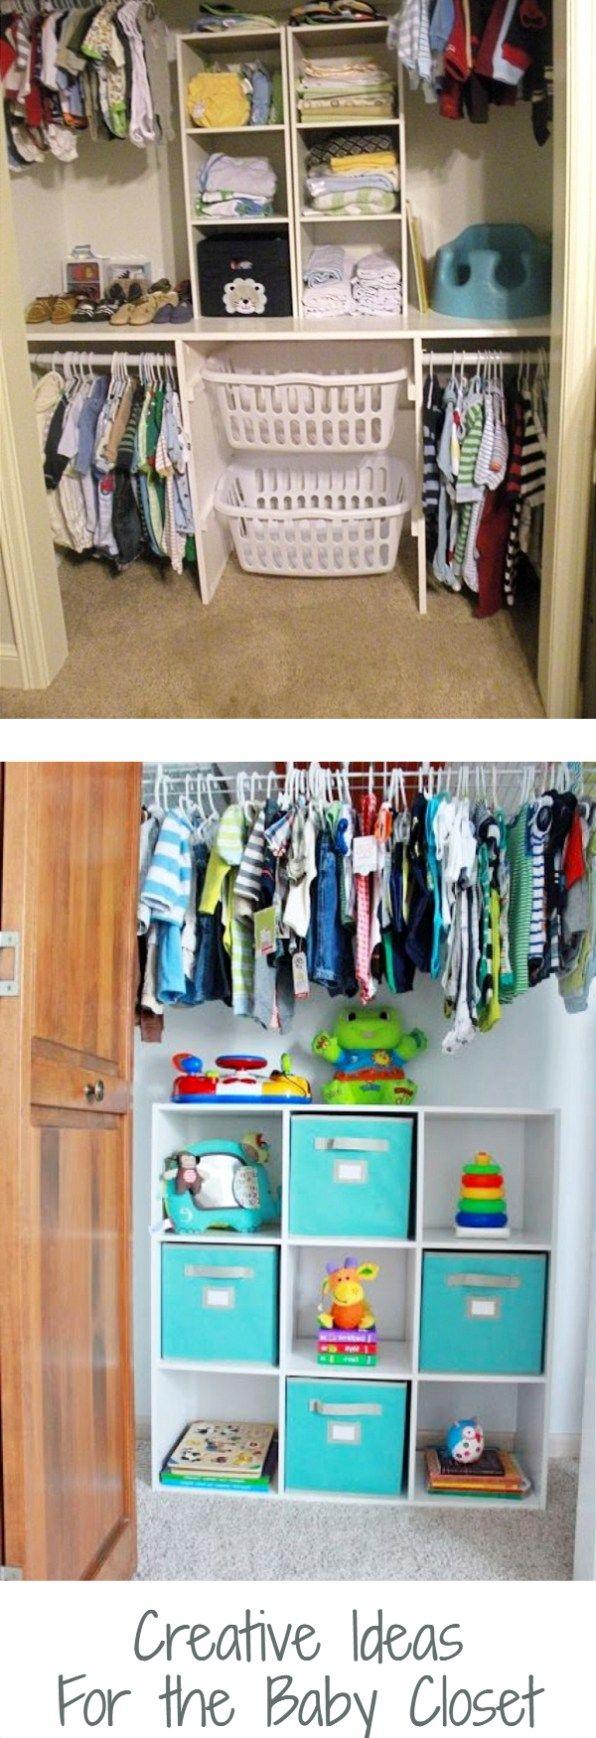 28+ Baby Closet Organization Ideas - Nursery Closet Organization